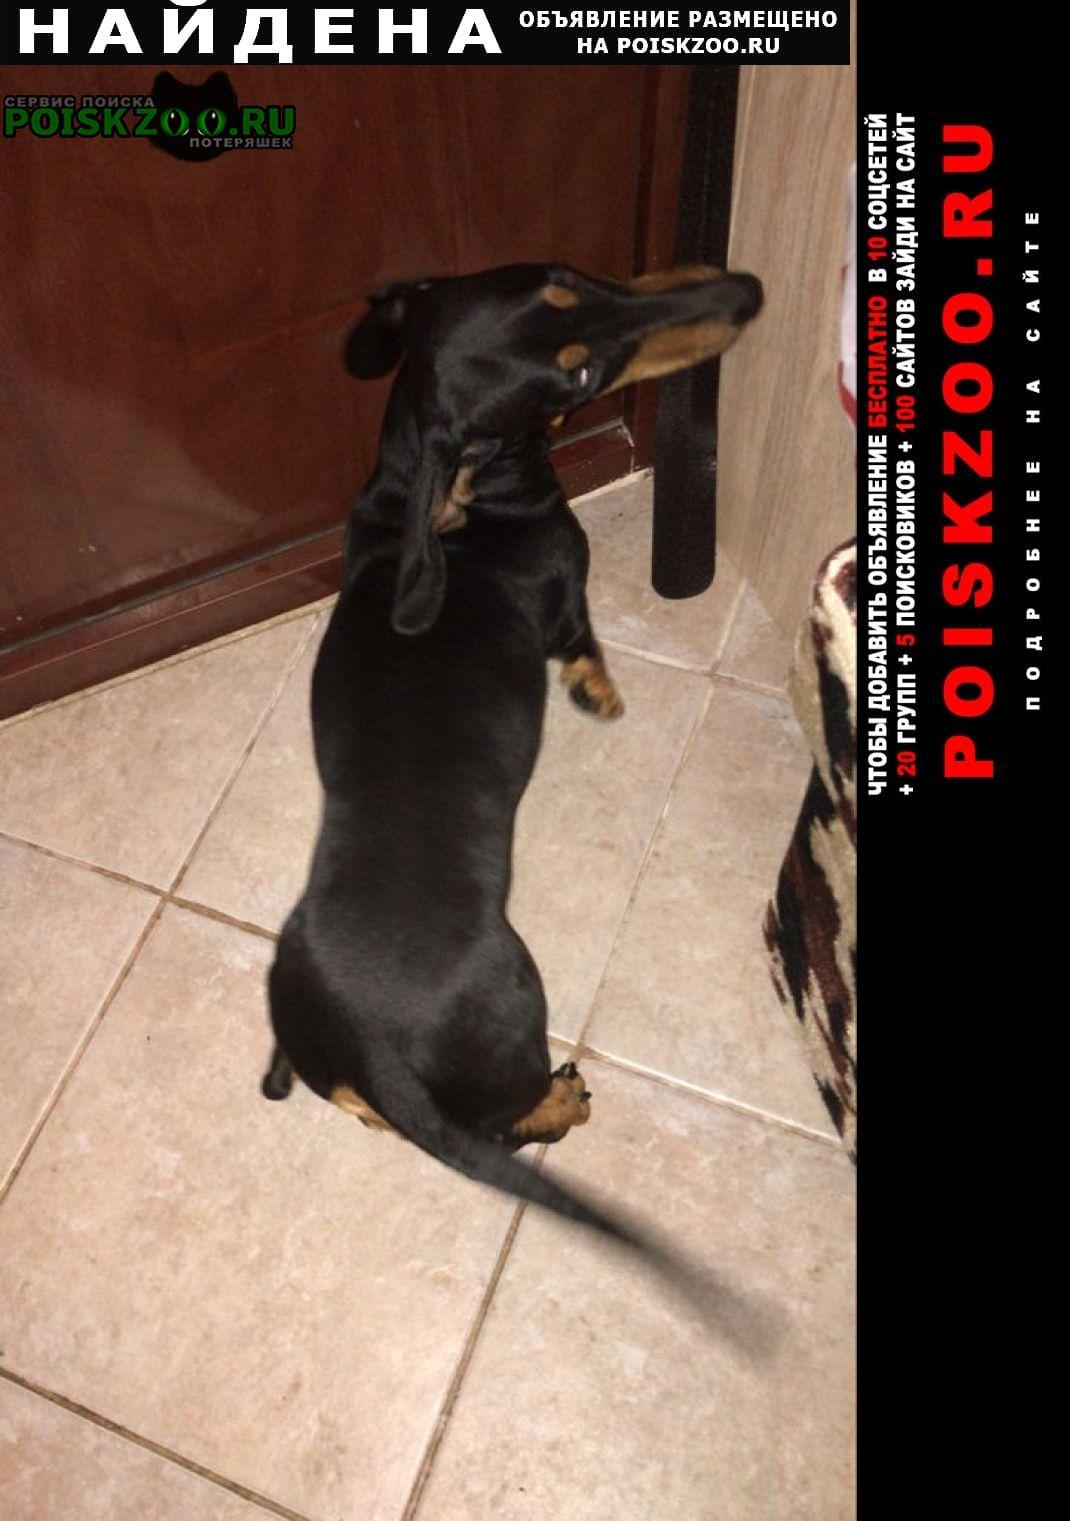 Найдена собака поселок санатория им.герцена Полушкино